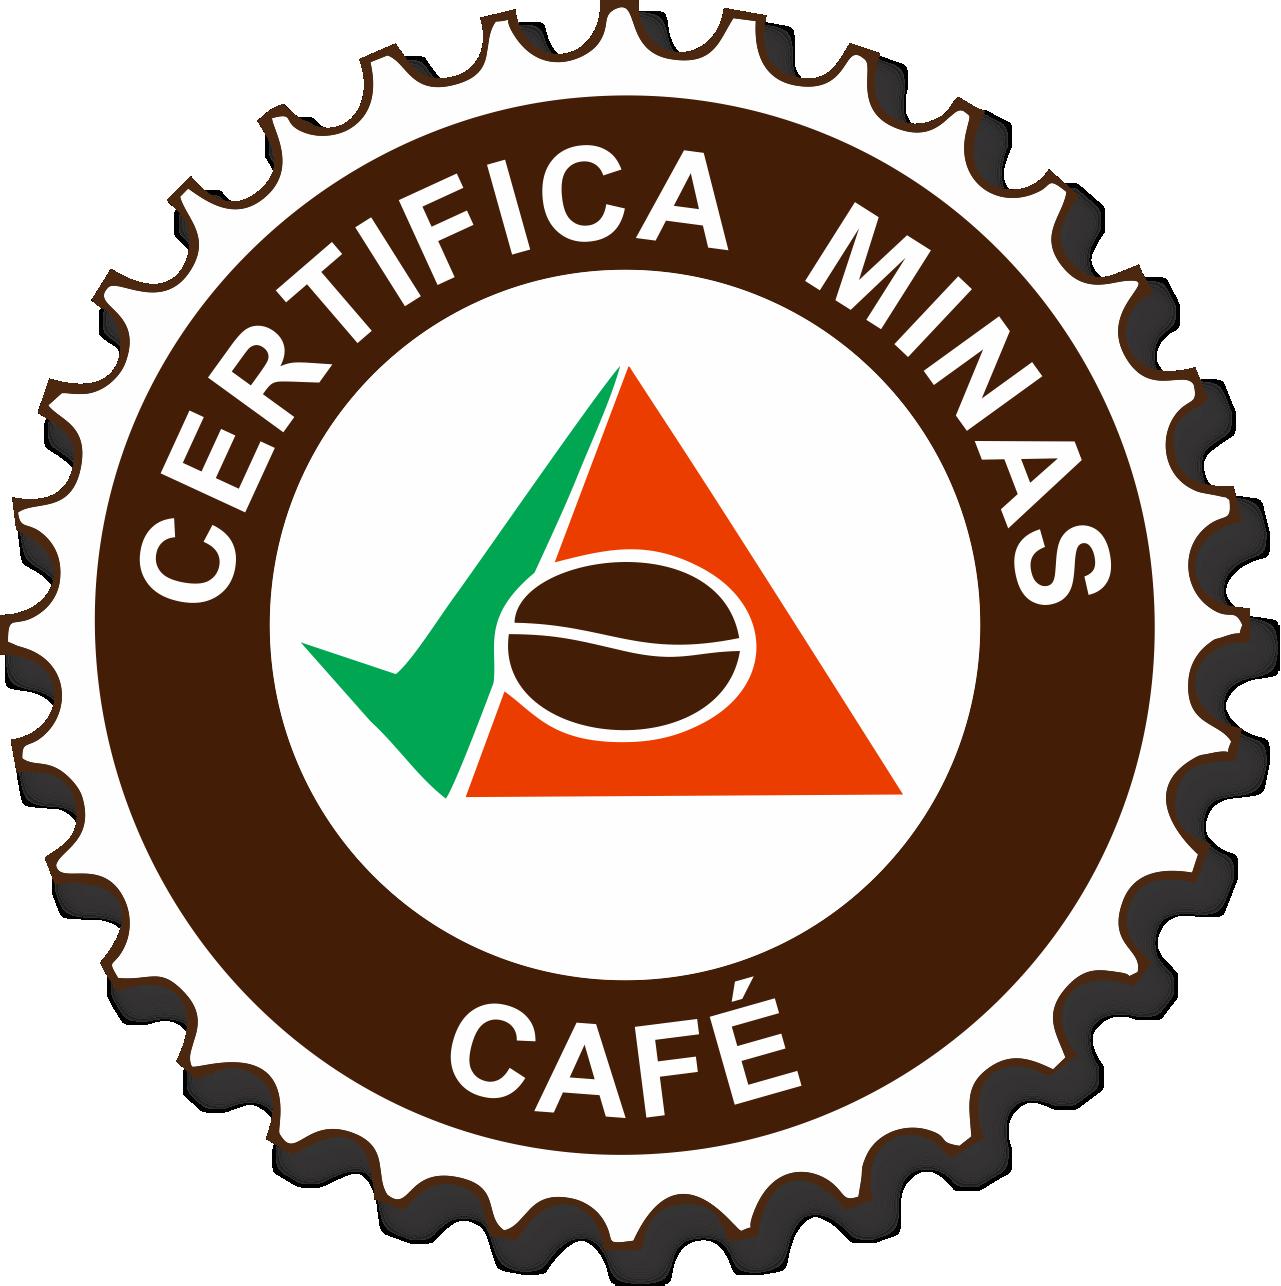 certifica-minas Exportadora de cafe guaxupe